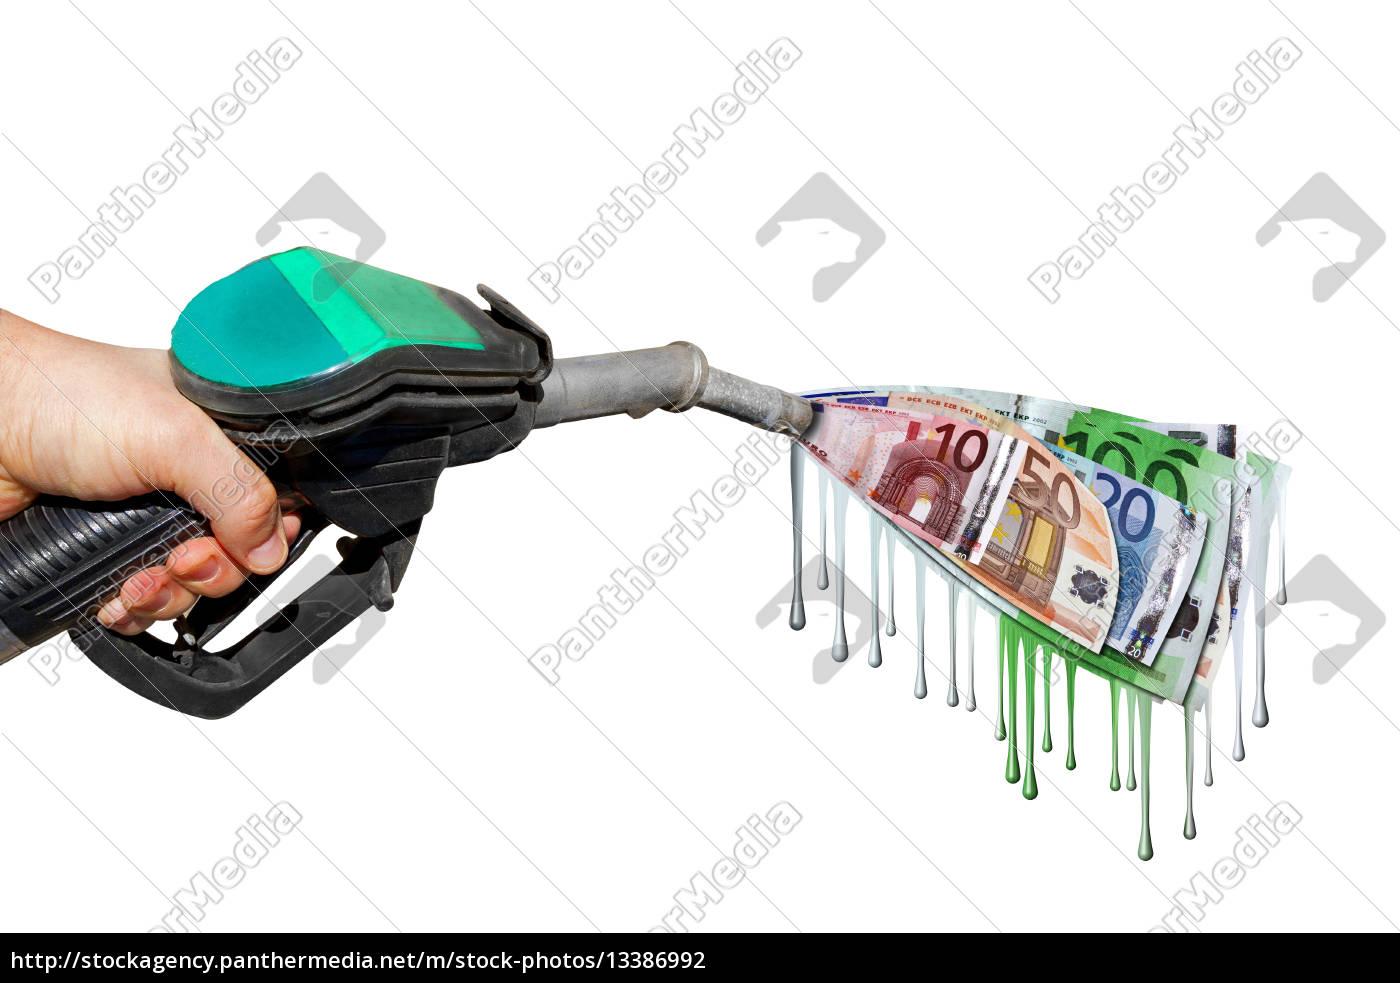 benzinpreis, hand, Benzin, geld, euro, kosten - 13386992